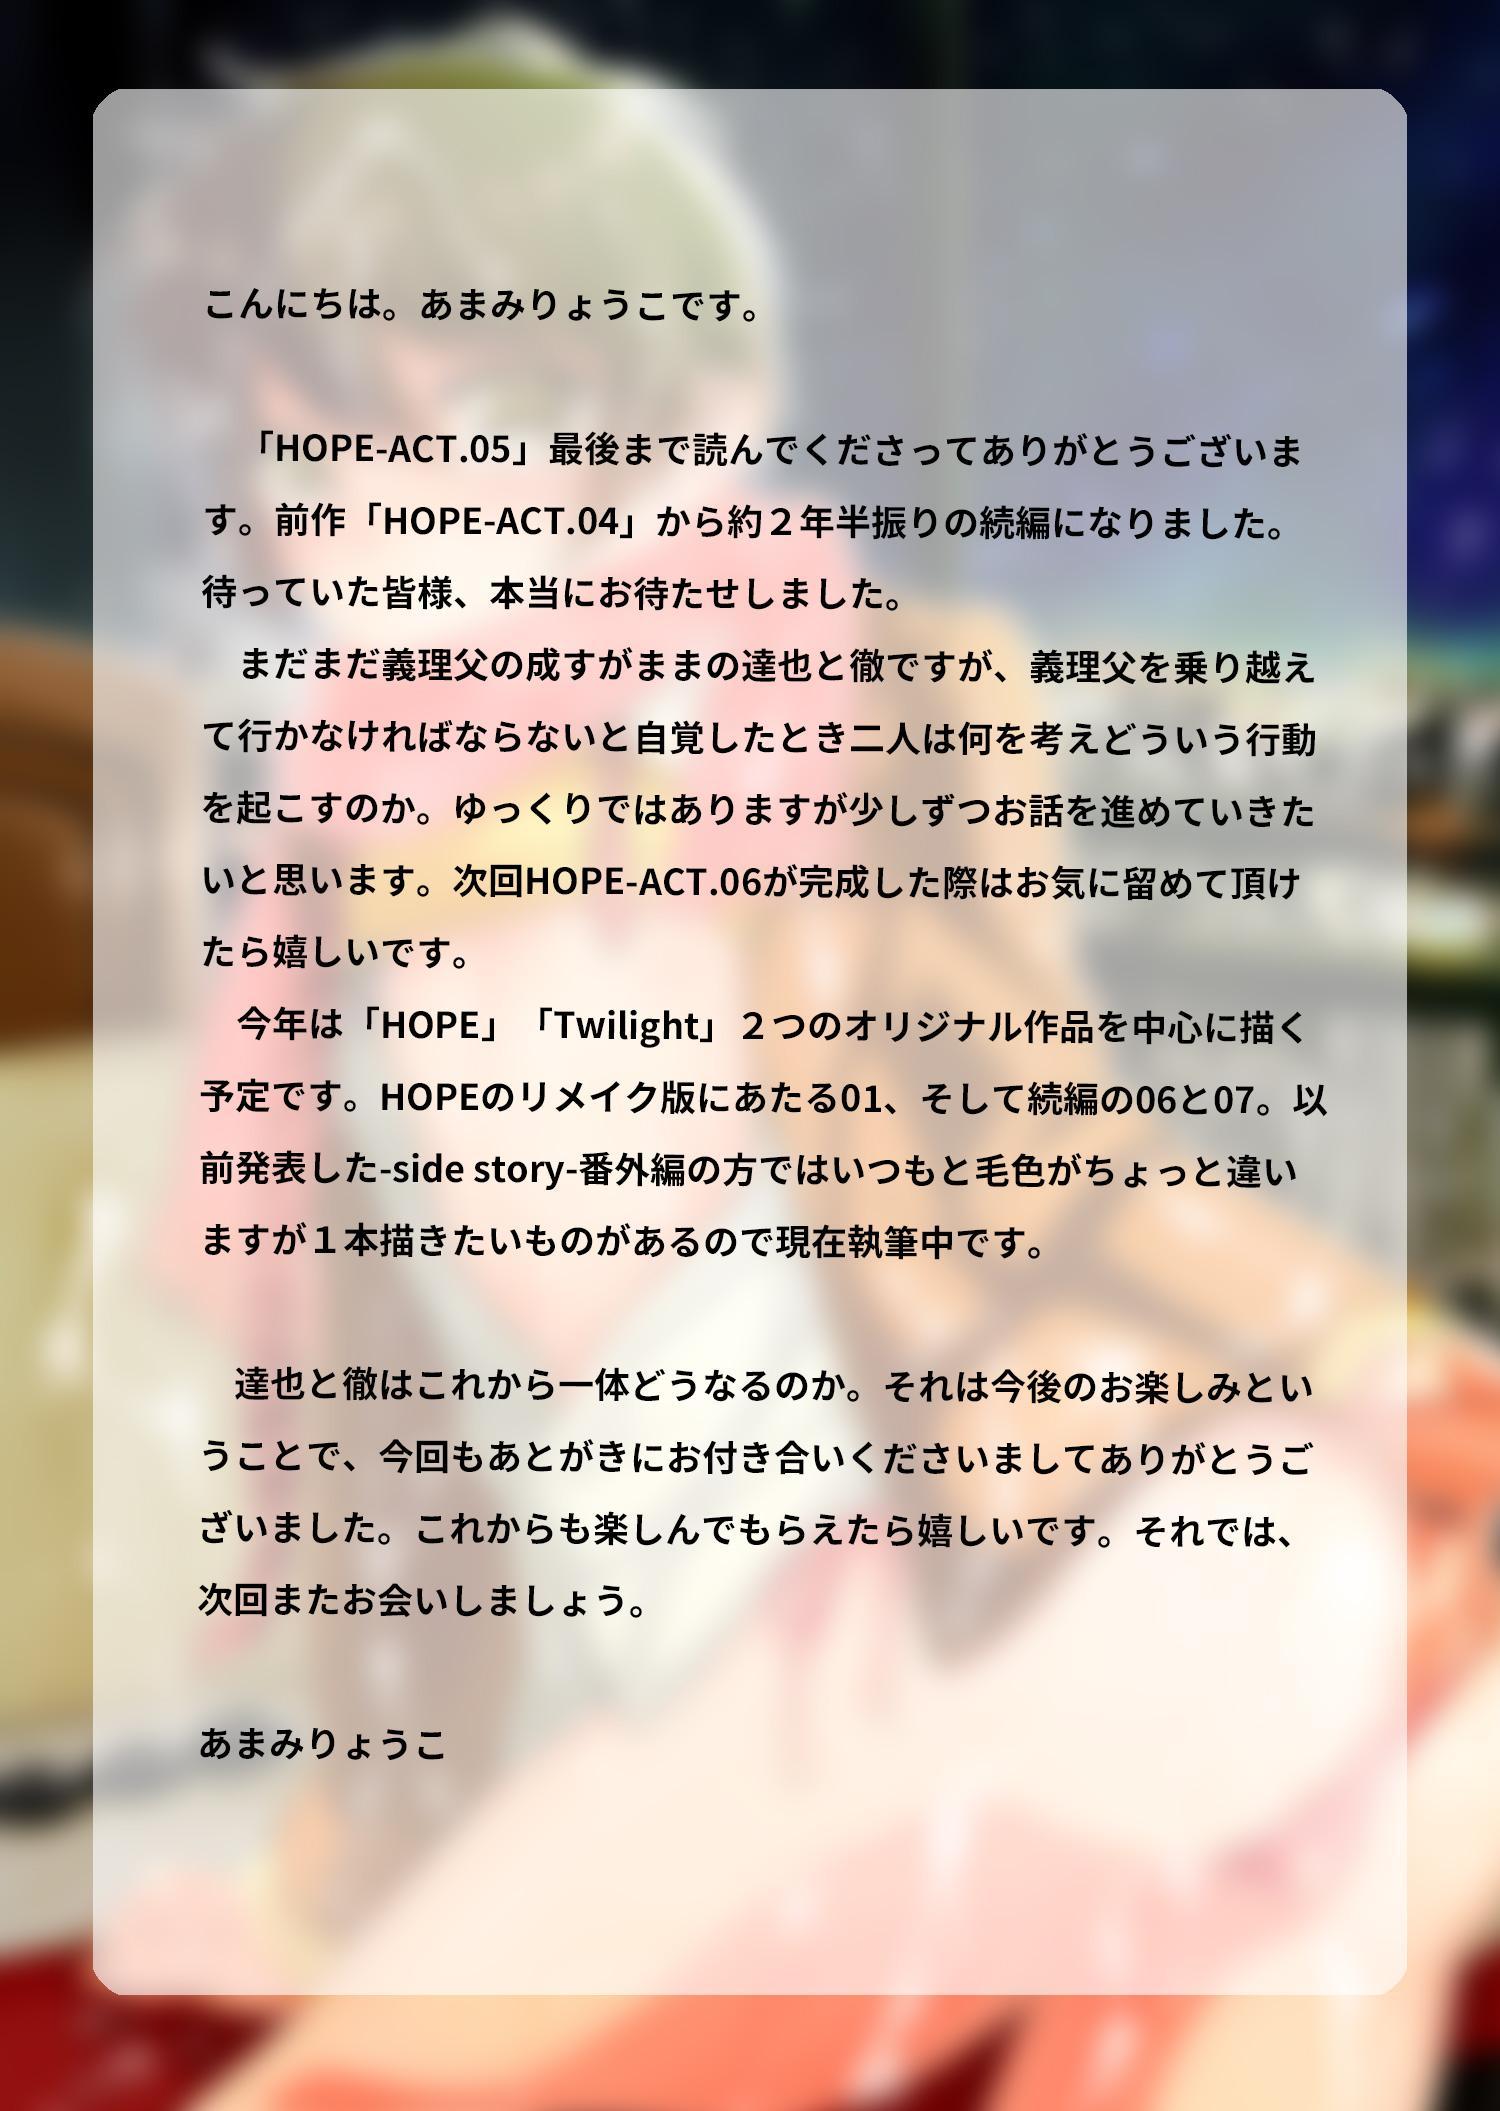 HOPE-ACT. 05 33